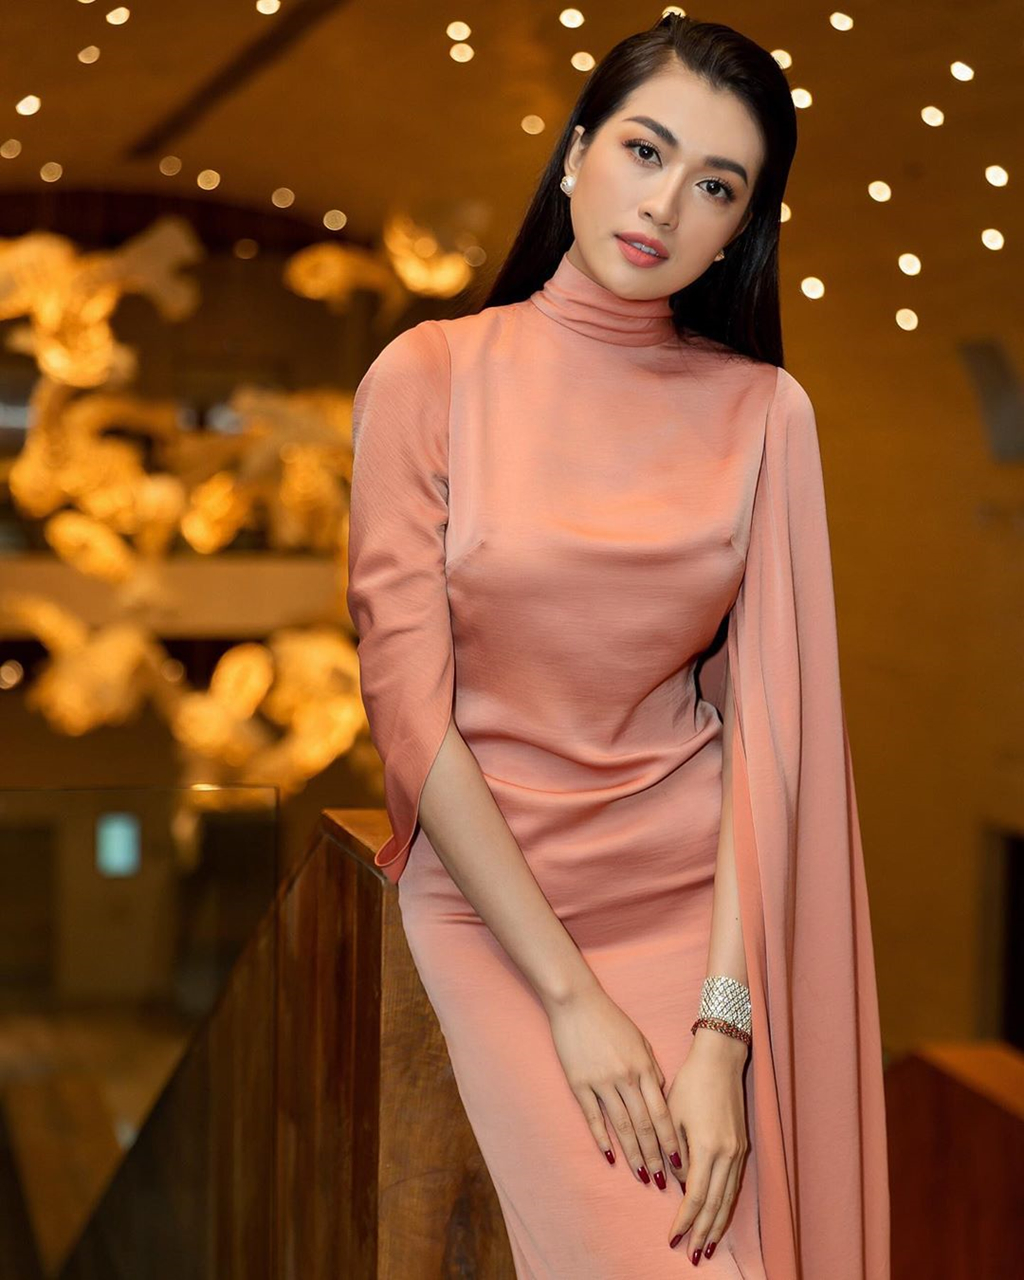 Top 5 Hoa hau Hoan vu Viet Nam - nguoi roi showbiz, nguoi cuoi dai gia hinh anh 9